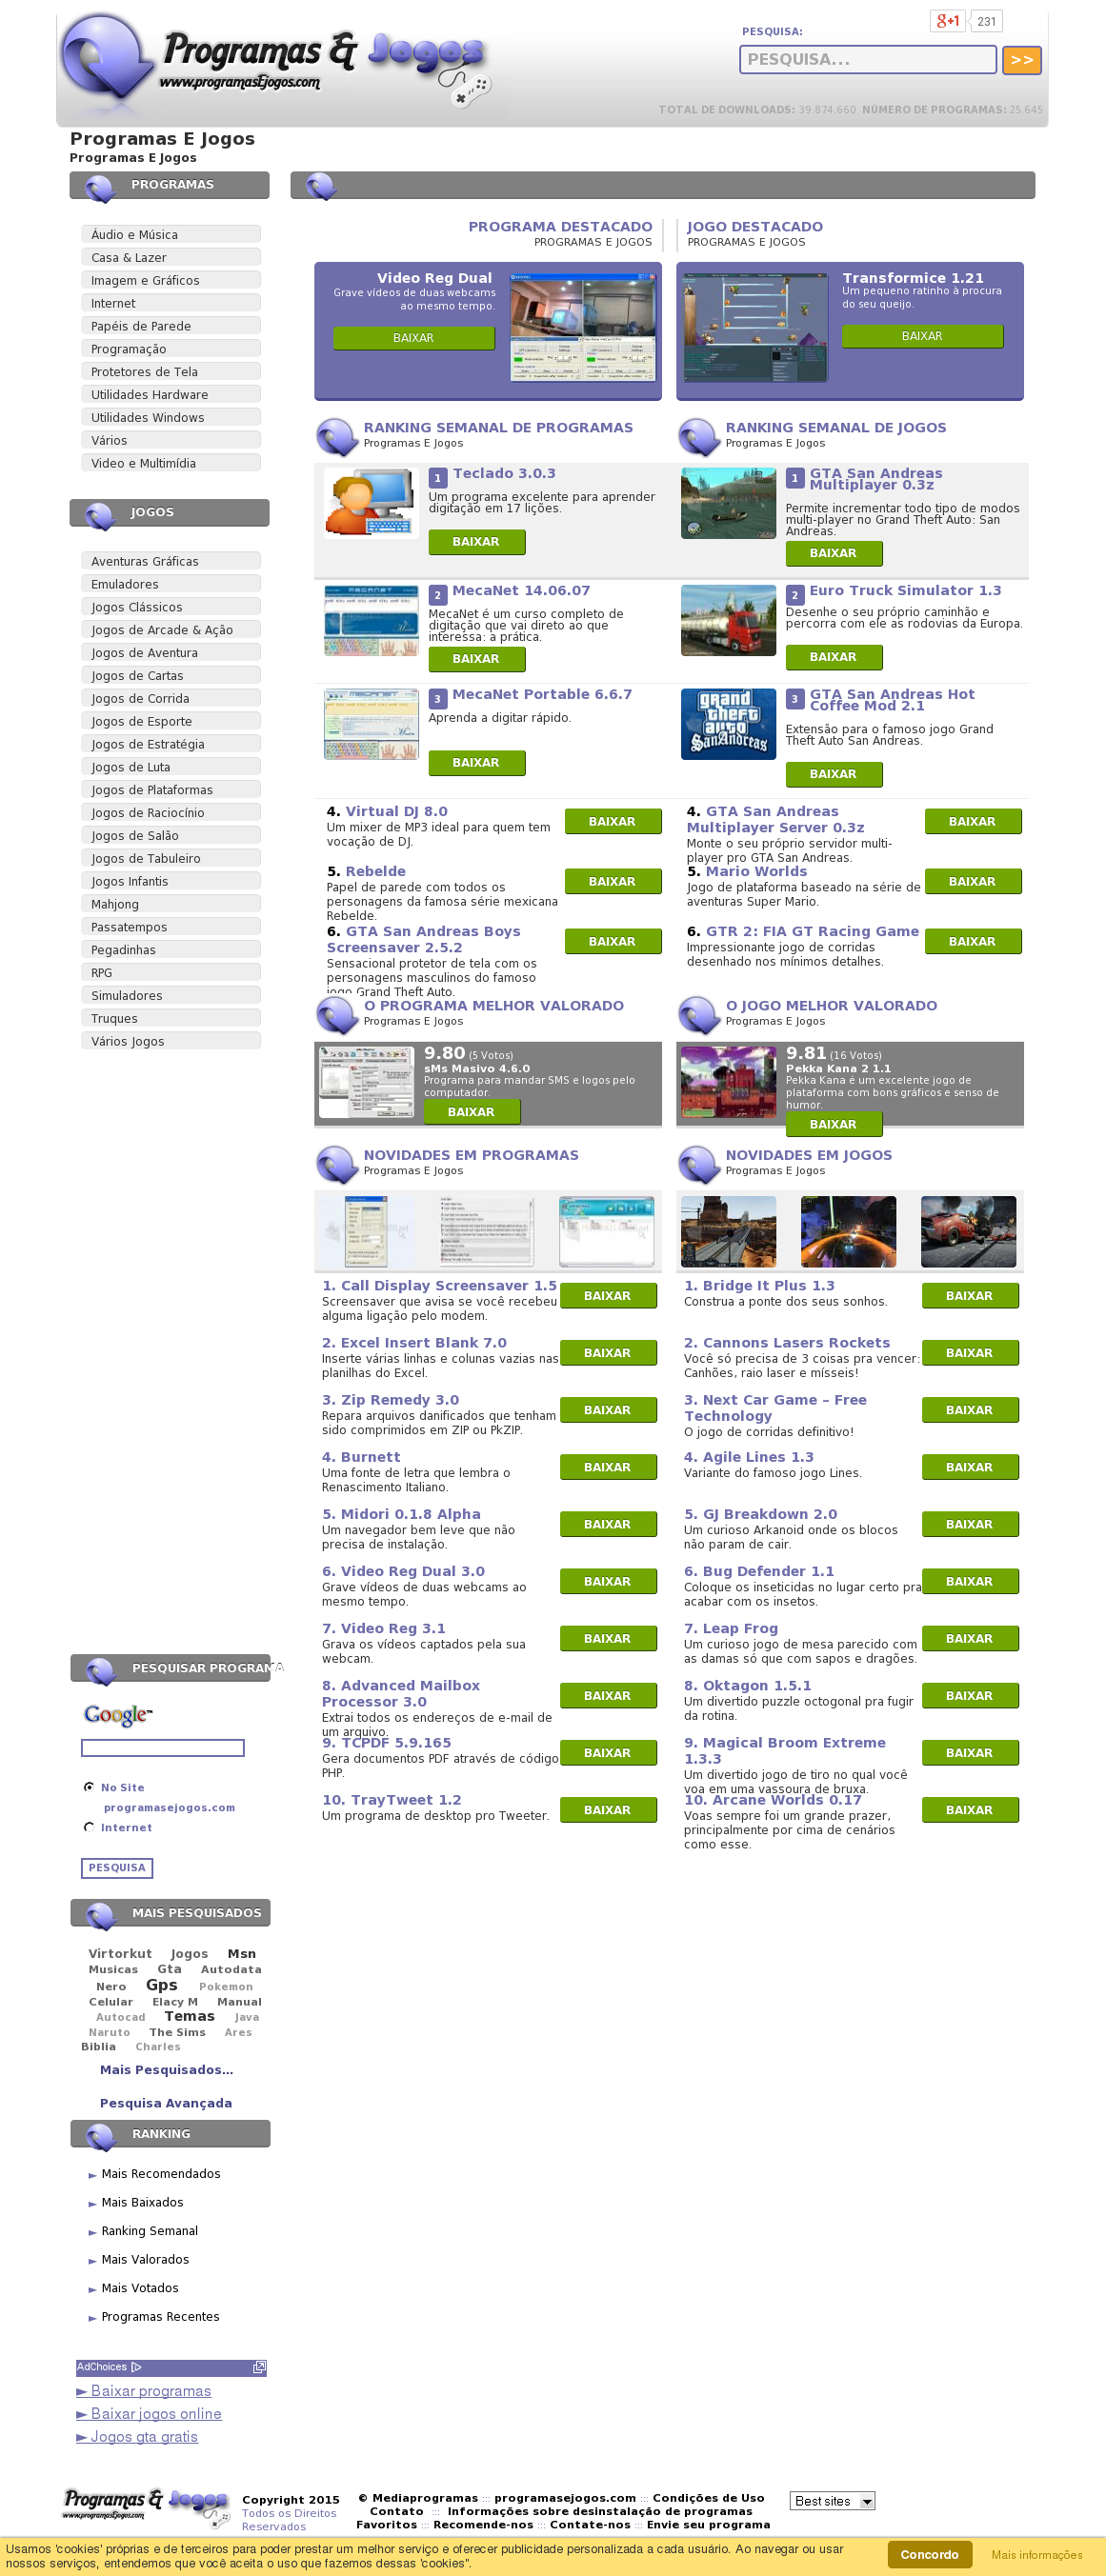 Programas E Jogos Competitors, Revenue and Employees - Owler Company